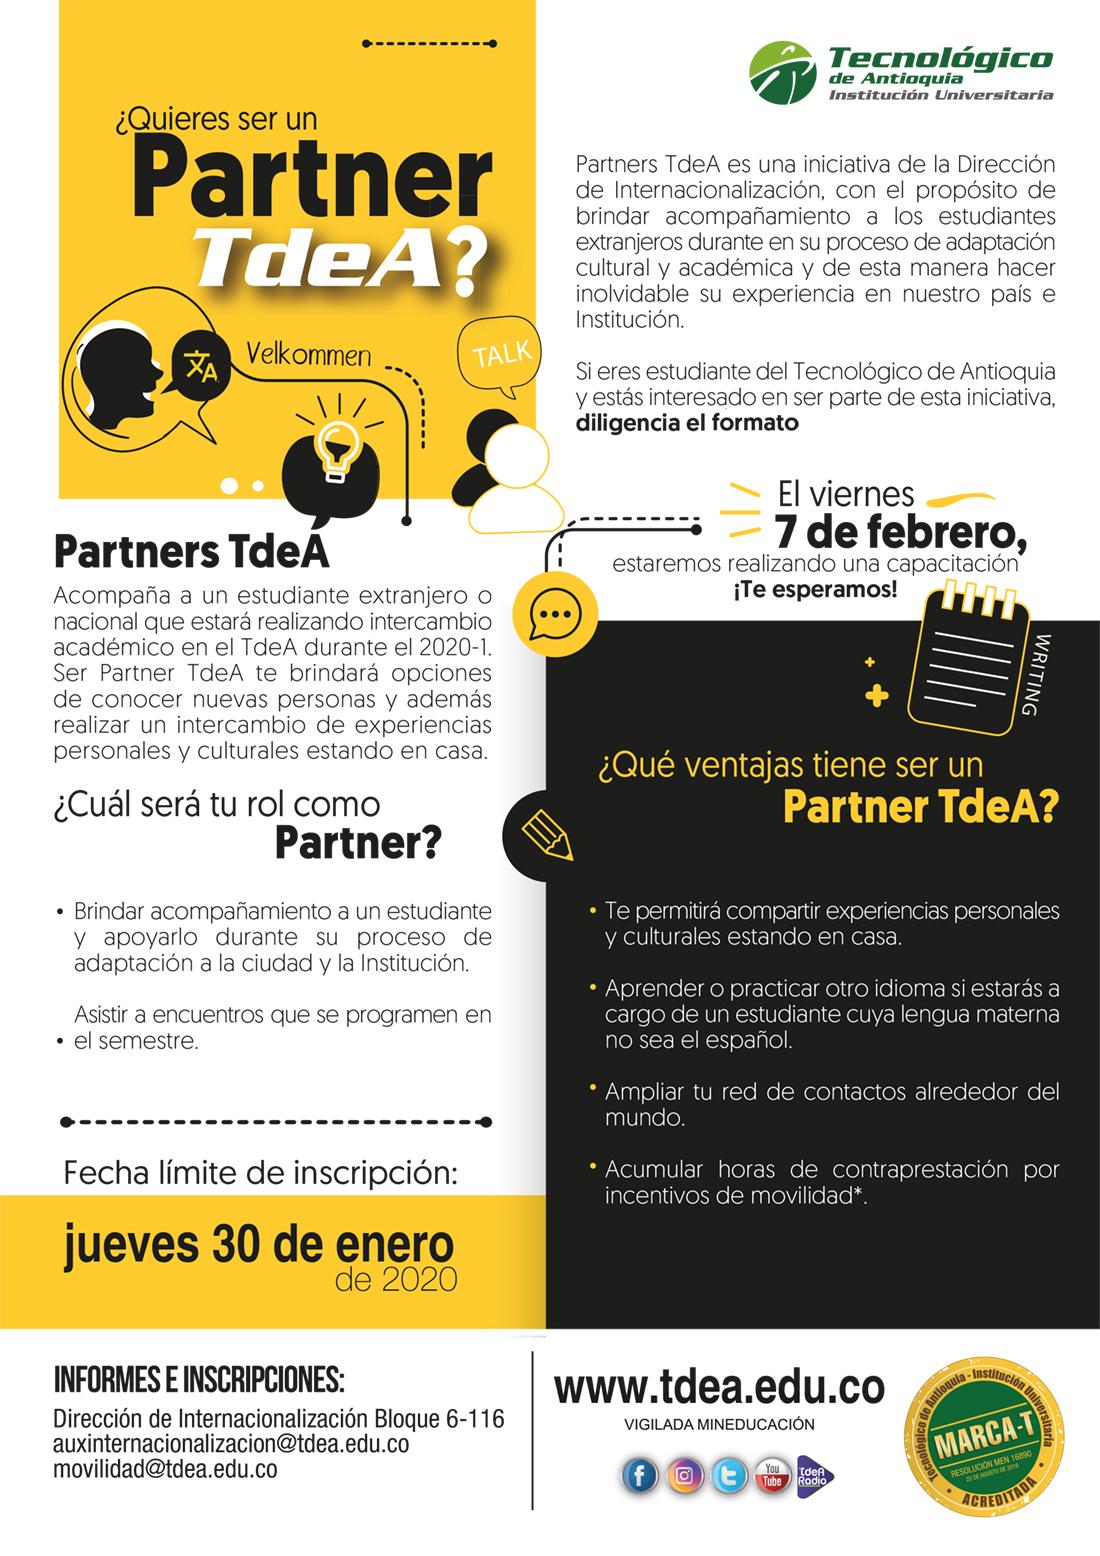 ¿Quieres ser un Partner TdeA?